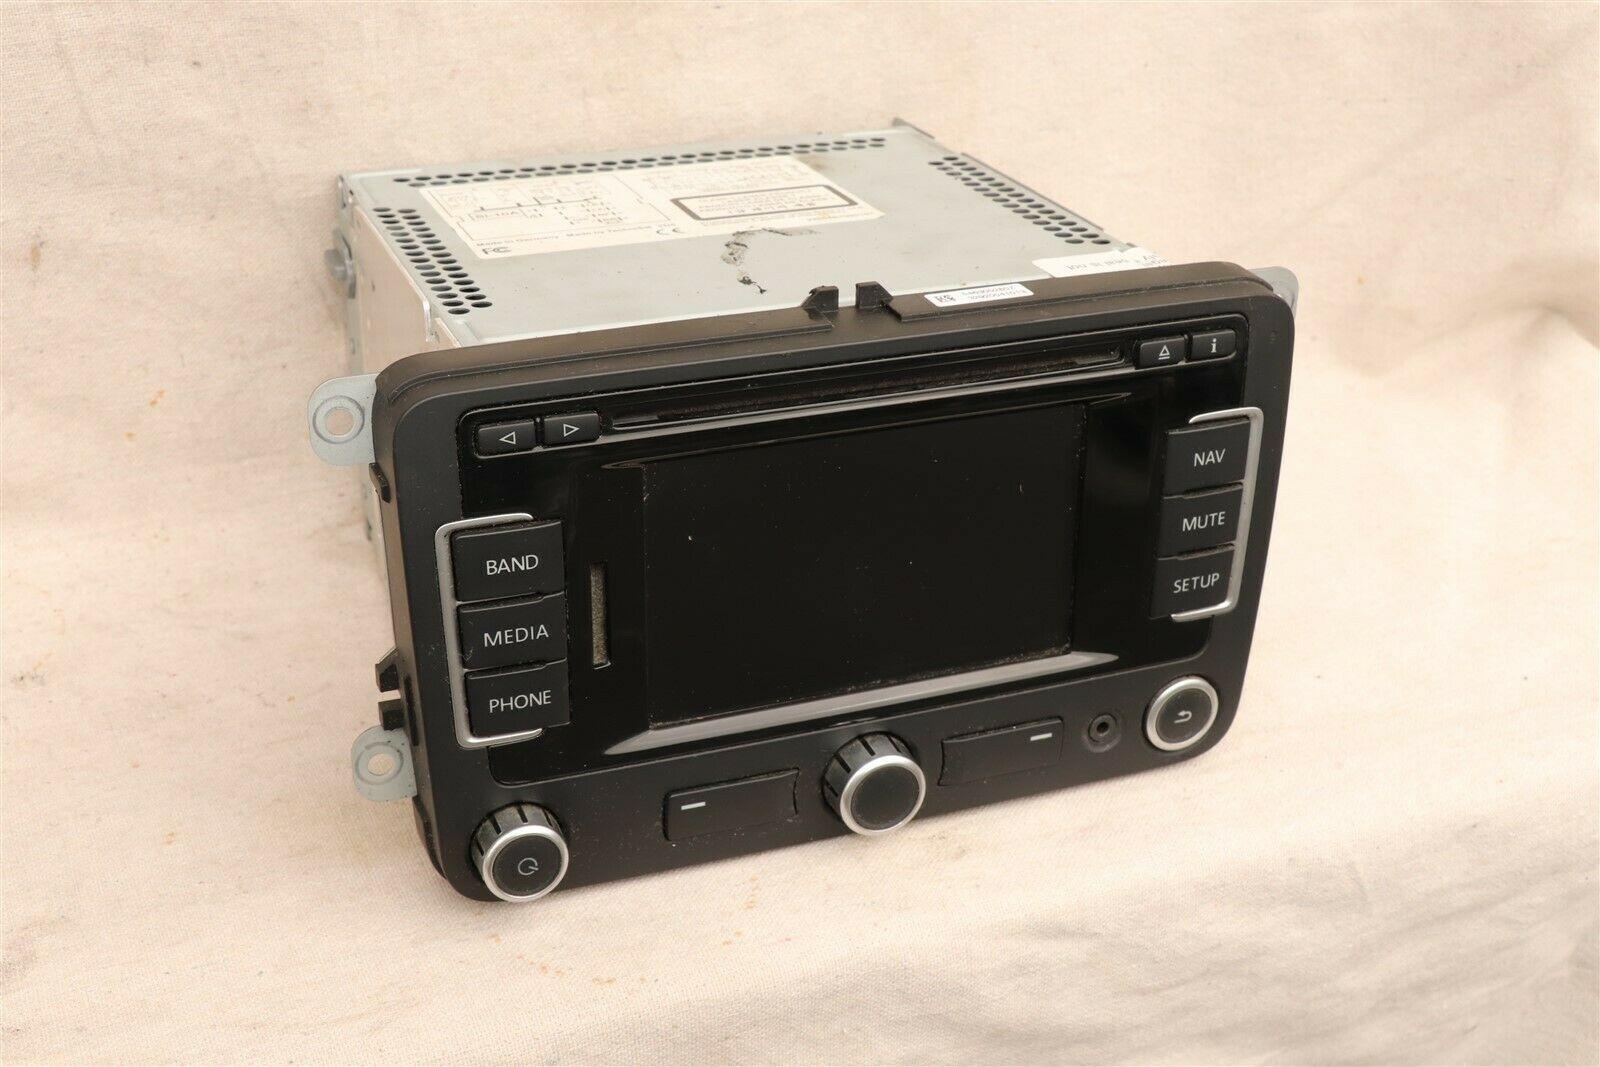 Volkswagen Golf Jetta CC EOS CD Nav Satellite Player Radio Stereo 1k0-035-274